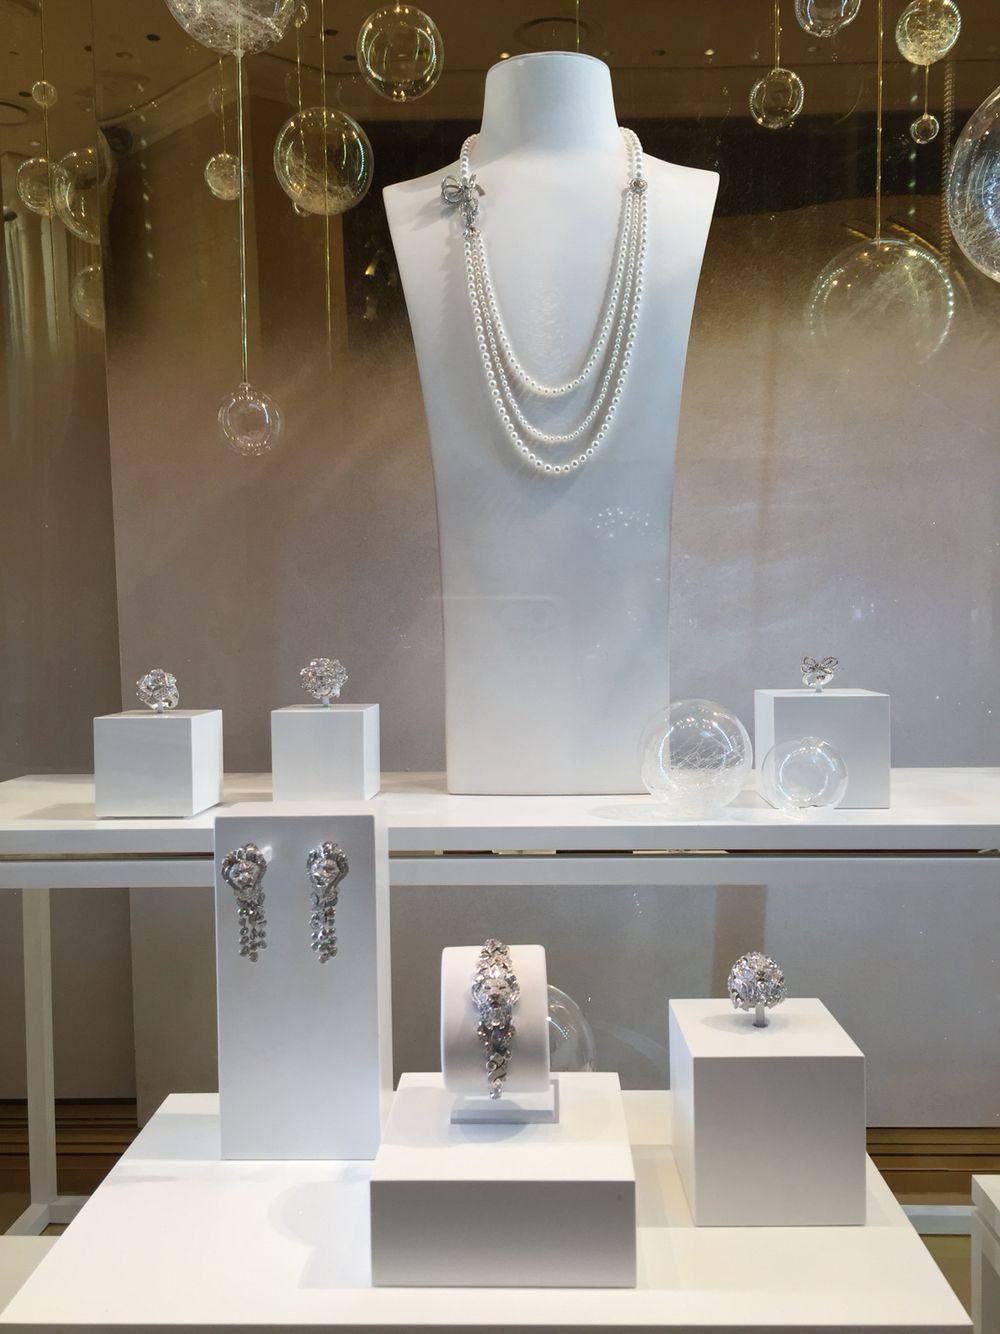 Window display ideas for jewelry  chanel fine jewelry window display at encore hotel las vegas